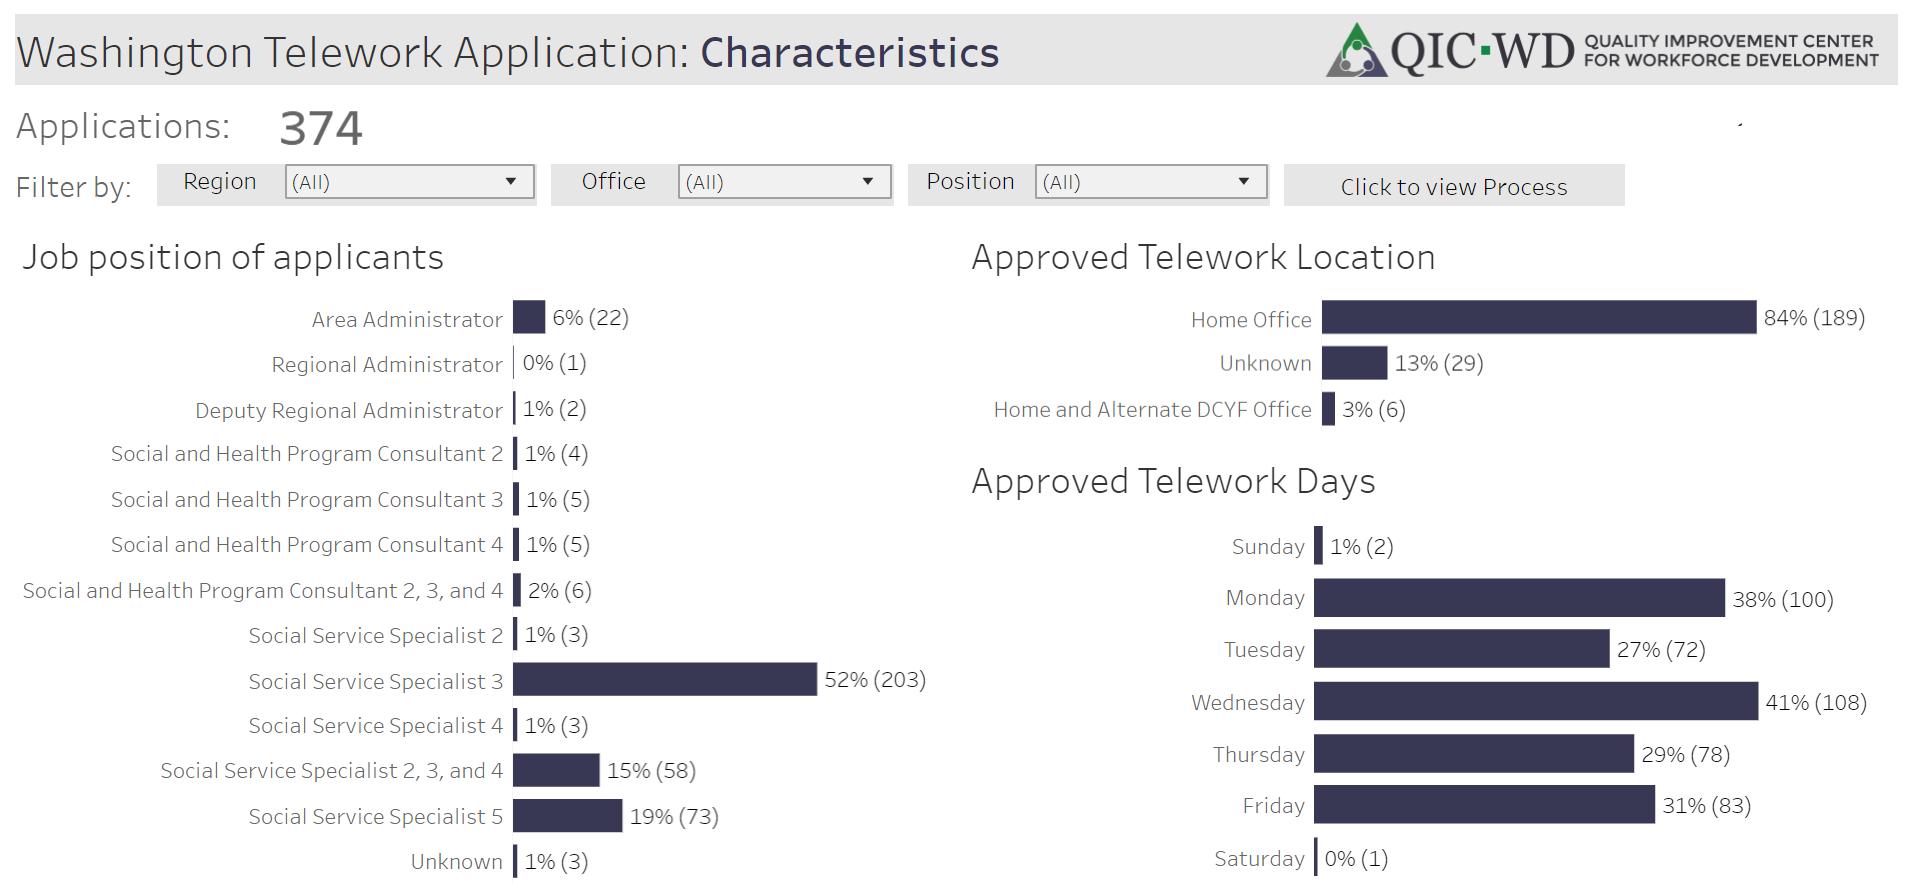 Washington Telework Applications: Characteristics